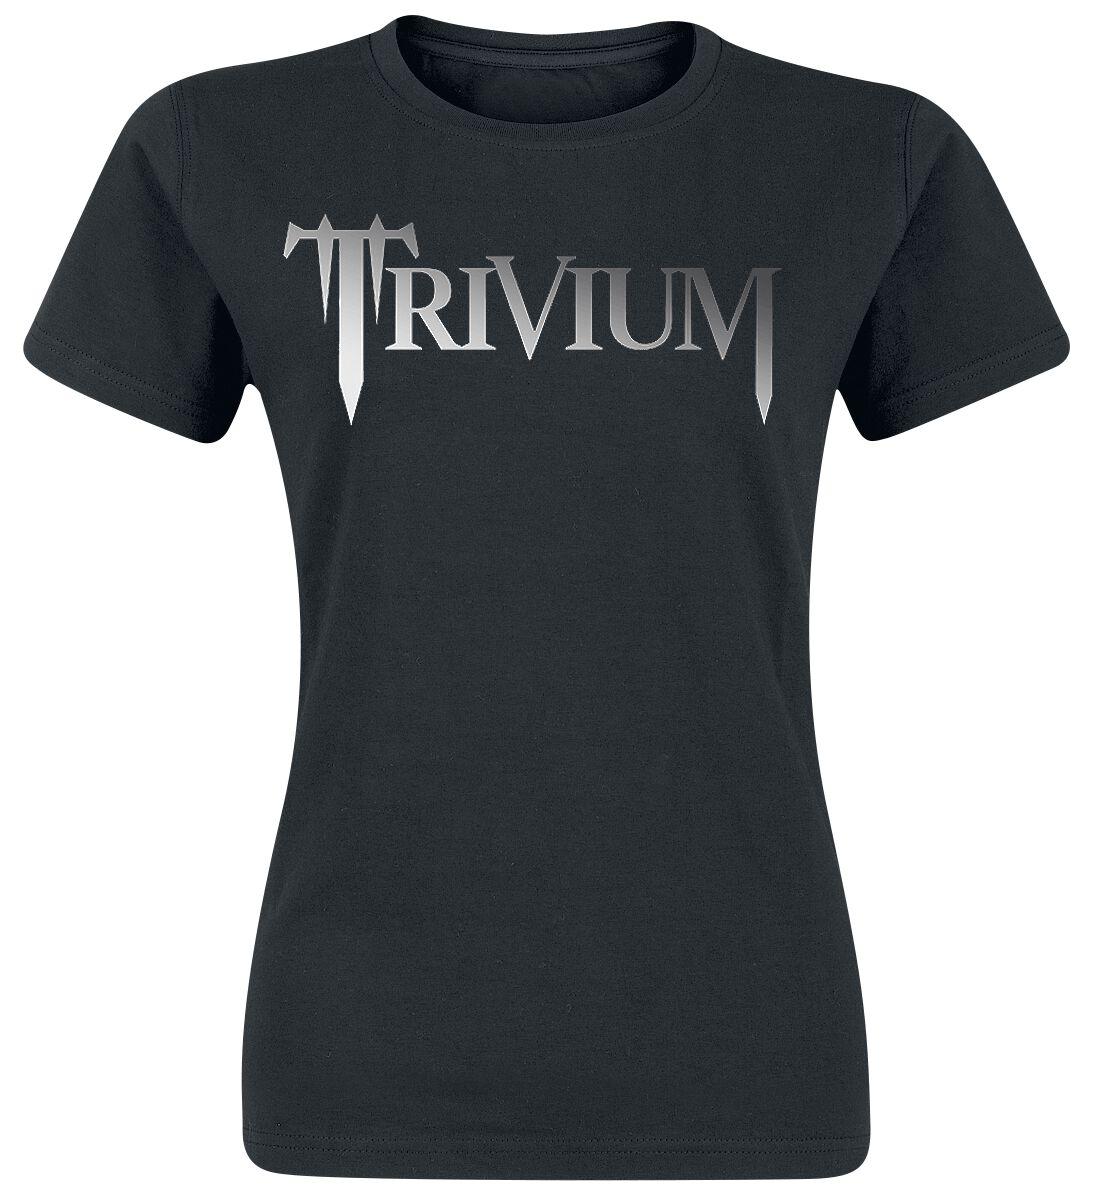 Zespoły - Koszulki - Koszulka damska Trivium Classic Logo Koszulka damska czarny - 369584